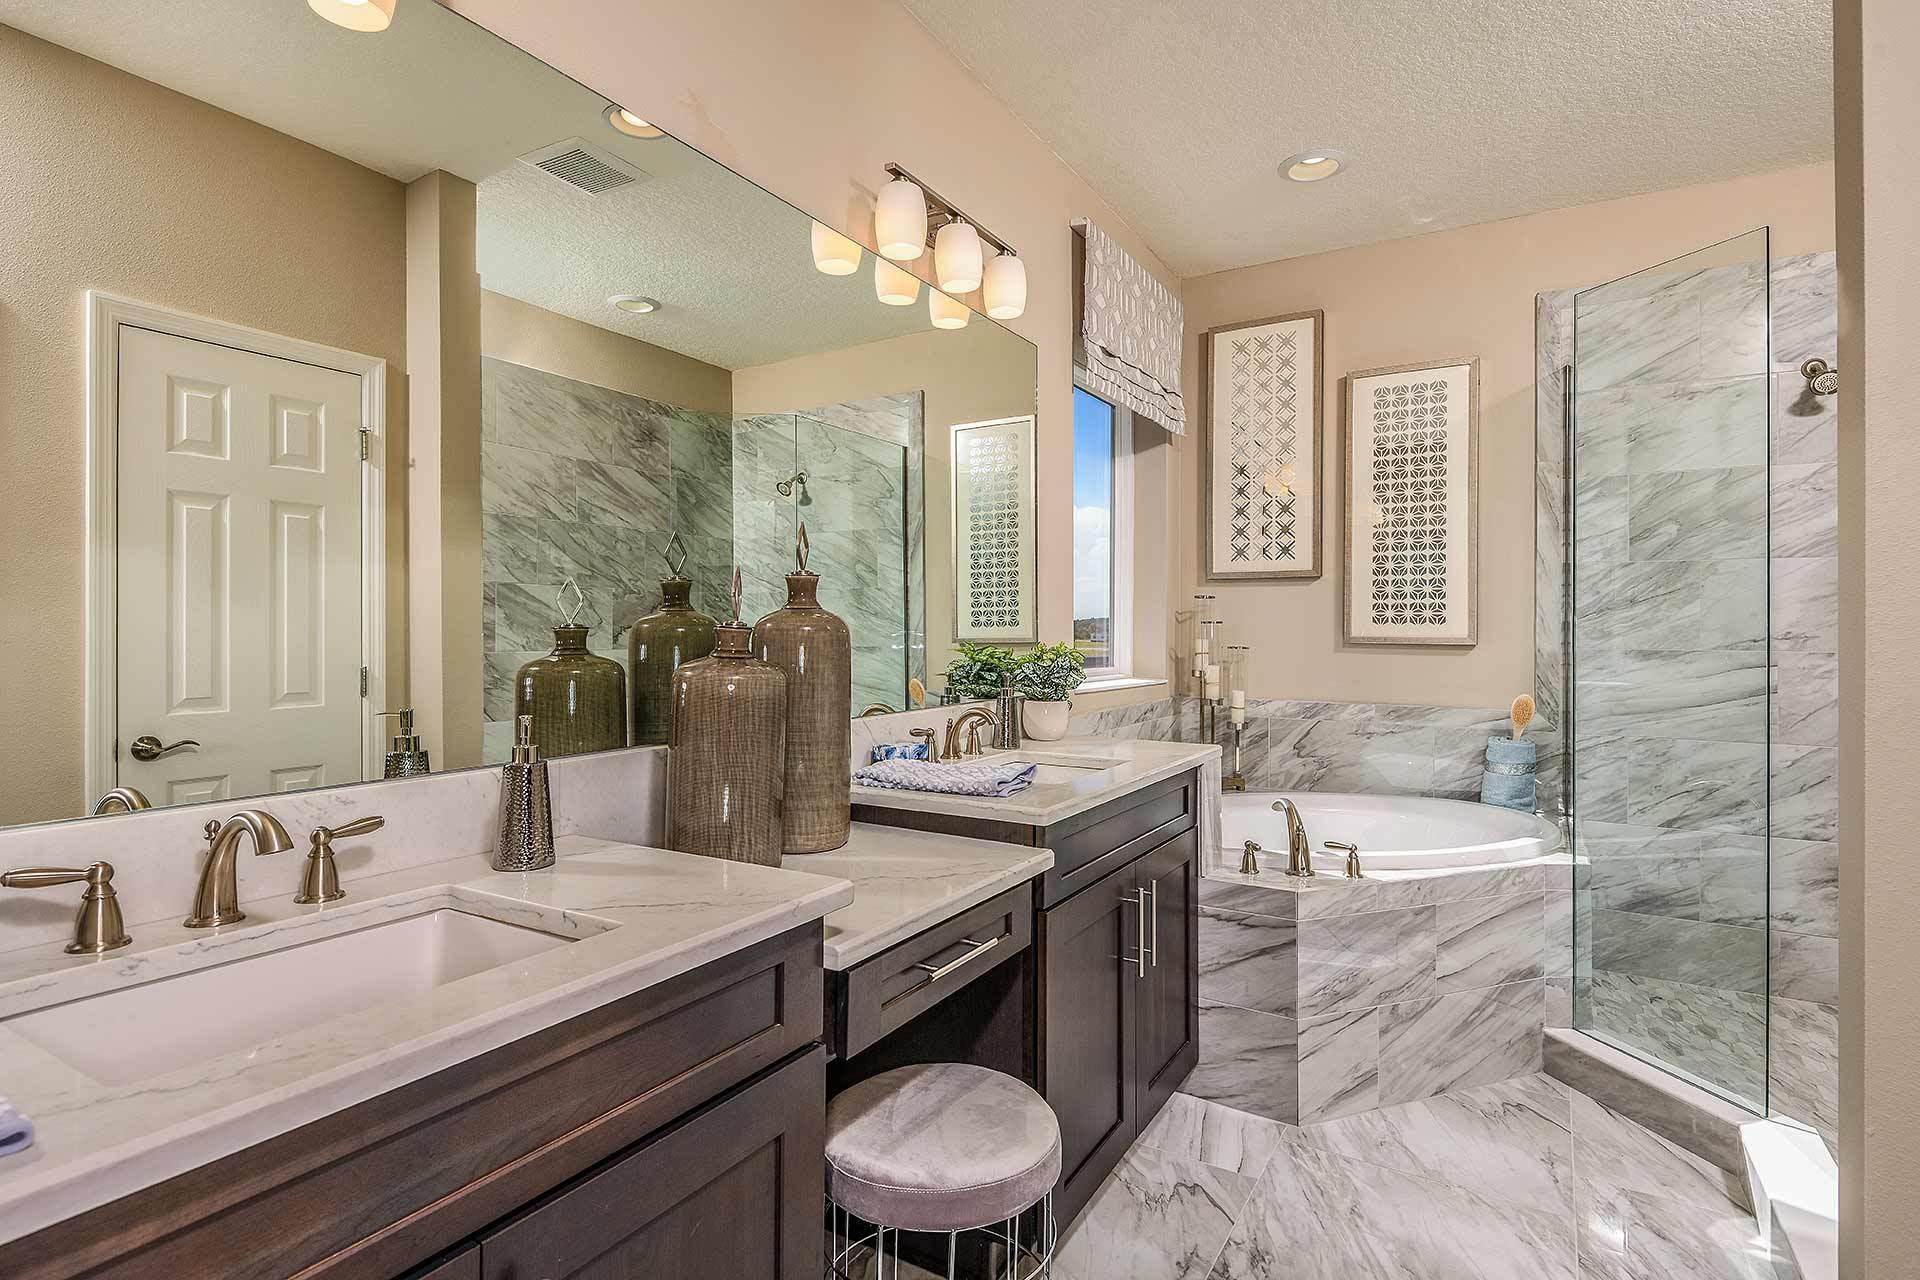 Bathroom featured in the Barbados By Taylor Morrison in Sarasota-Bradenton, FL